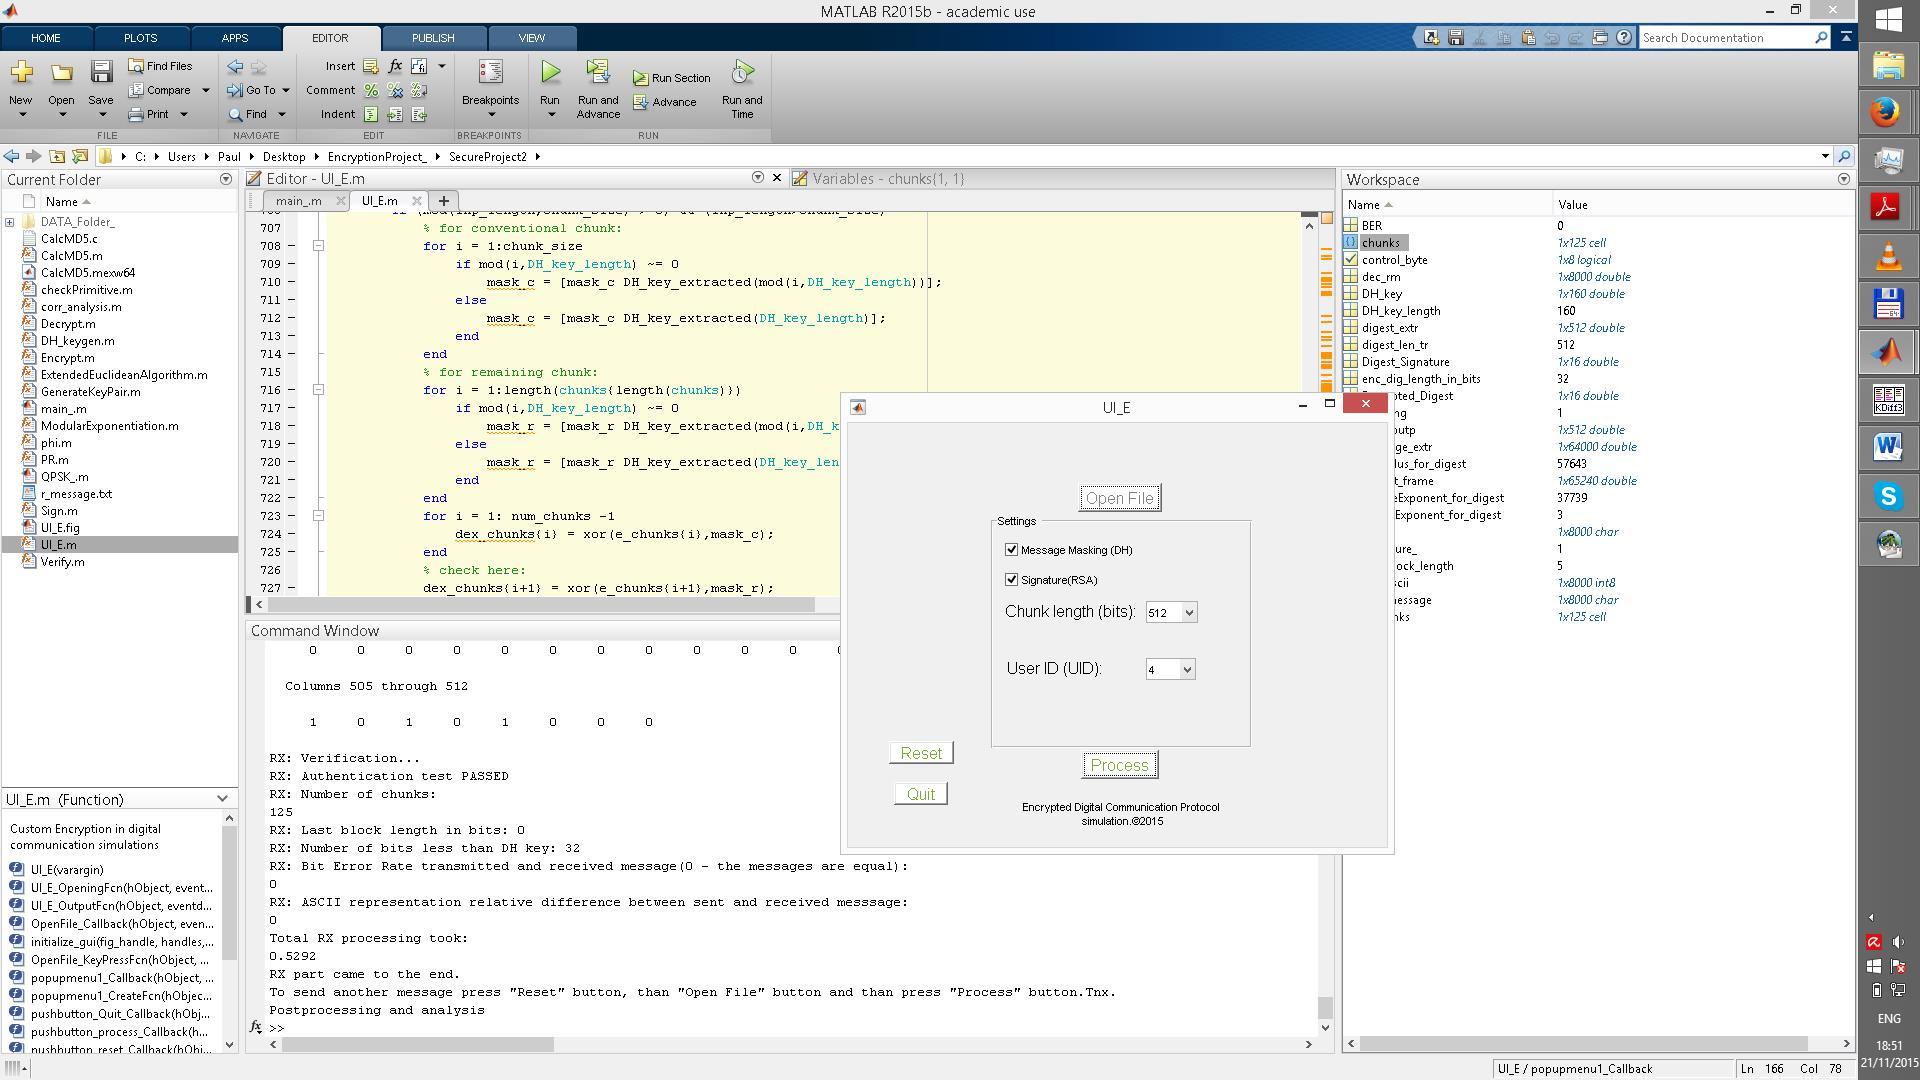 Custom encrypted Digital Communication simulation